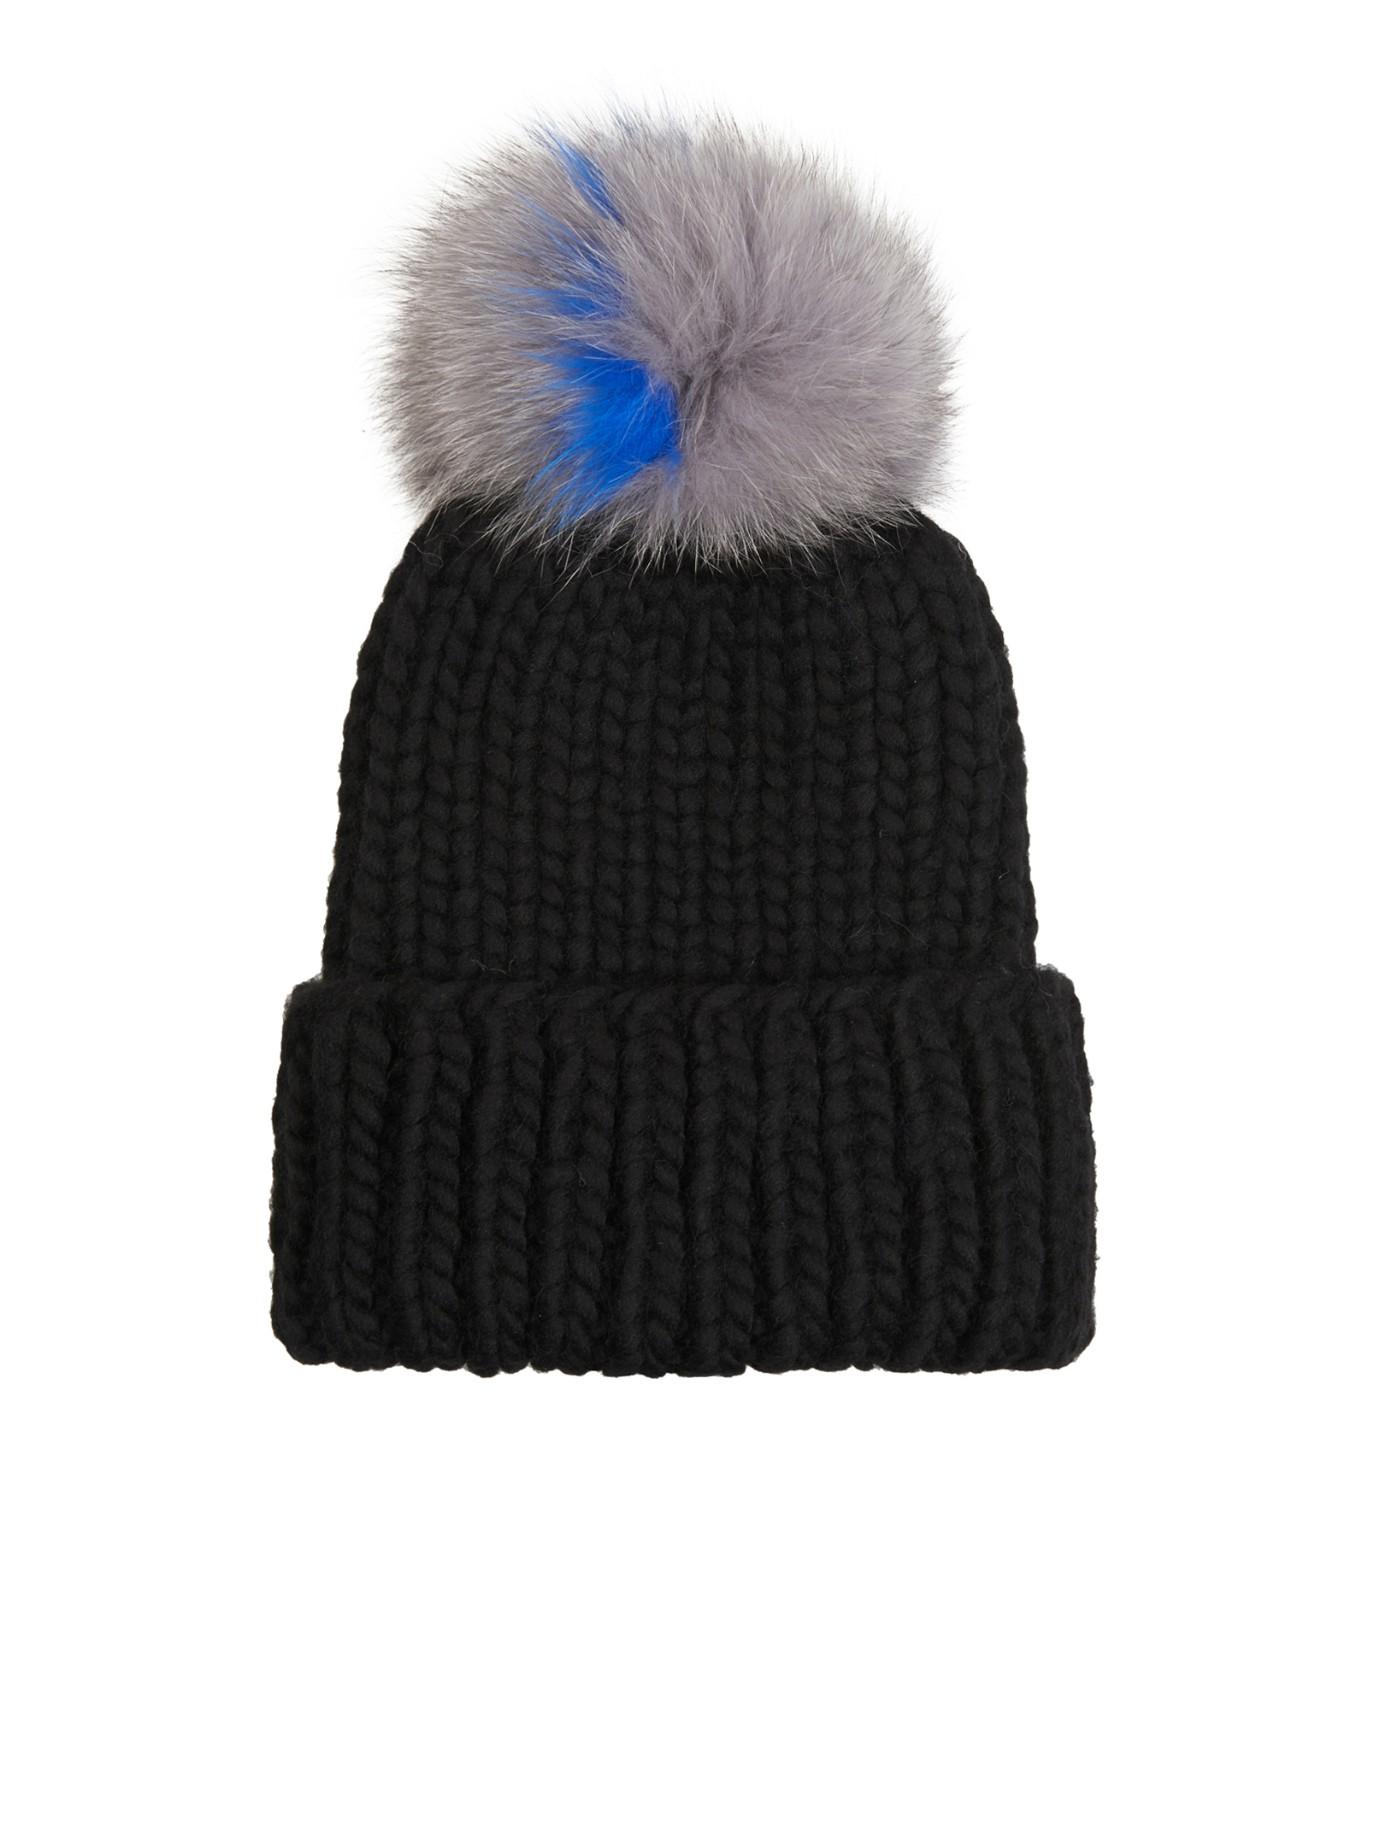 125707c74b1dec Eugenia Kim Rain Fur Pompom Beanie Hat in Black - Lyst